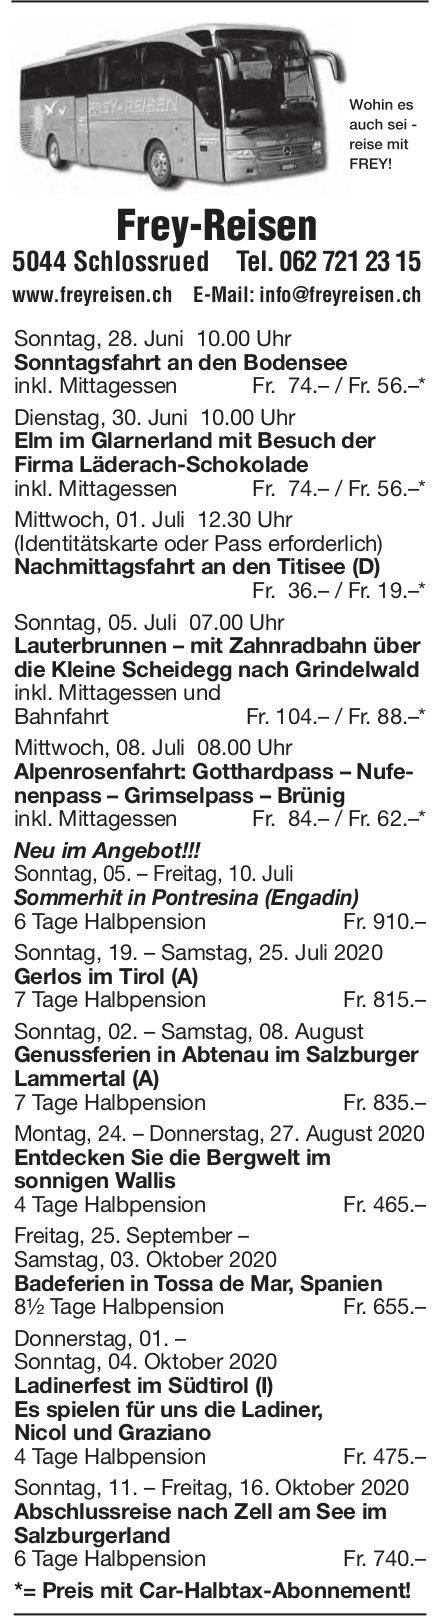 Reiseprogramm, 28. Juni - 16. Oktober, Frey-Reisen, Schlossrued